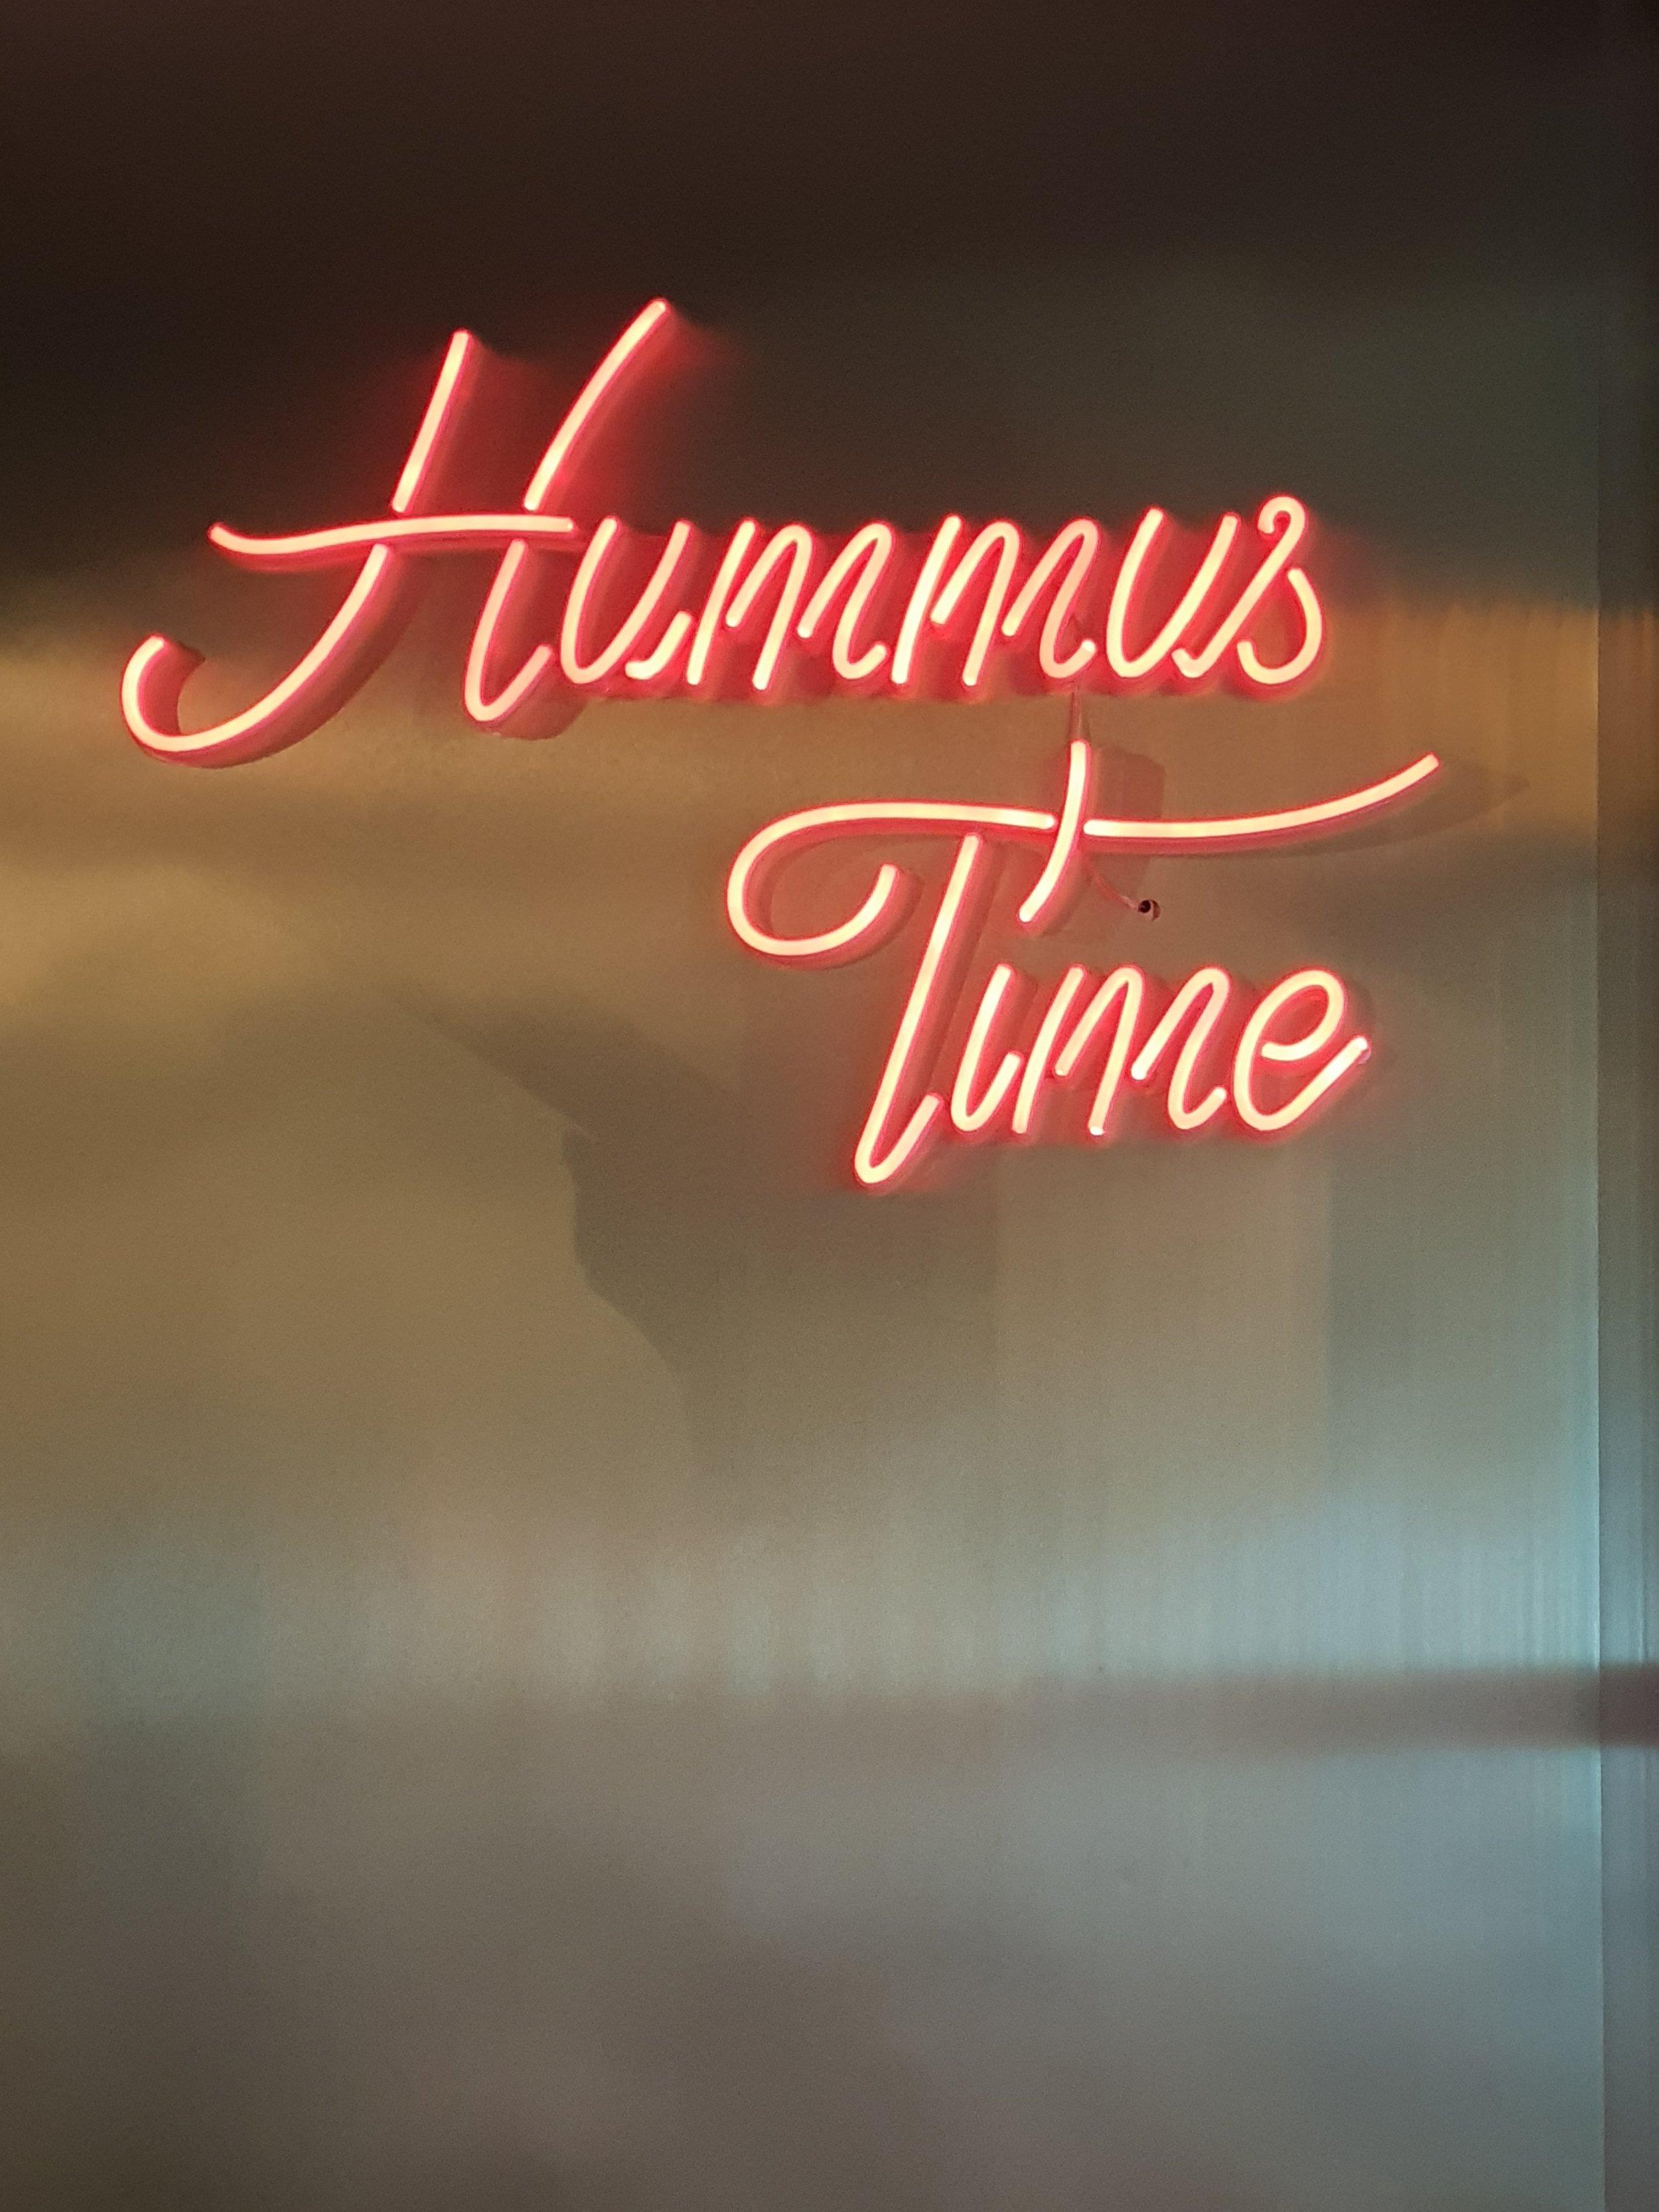 It's always Hummus time :-)